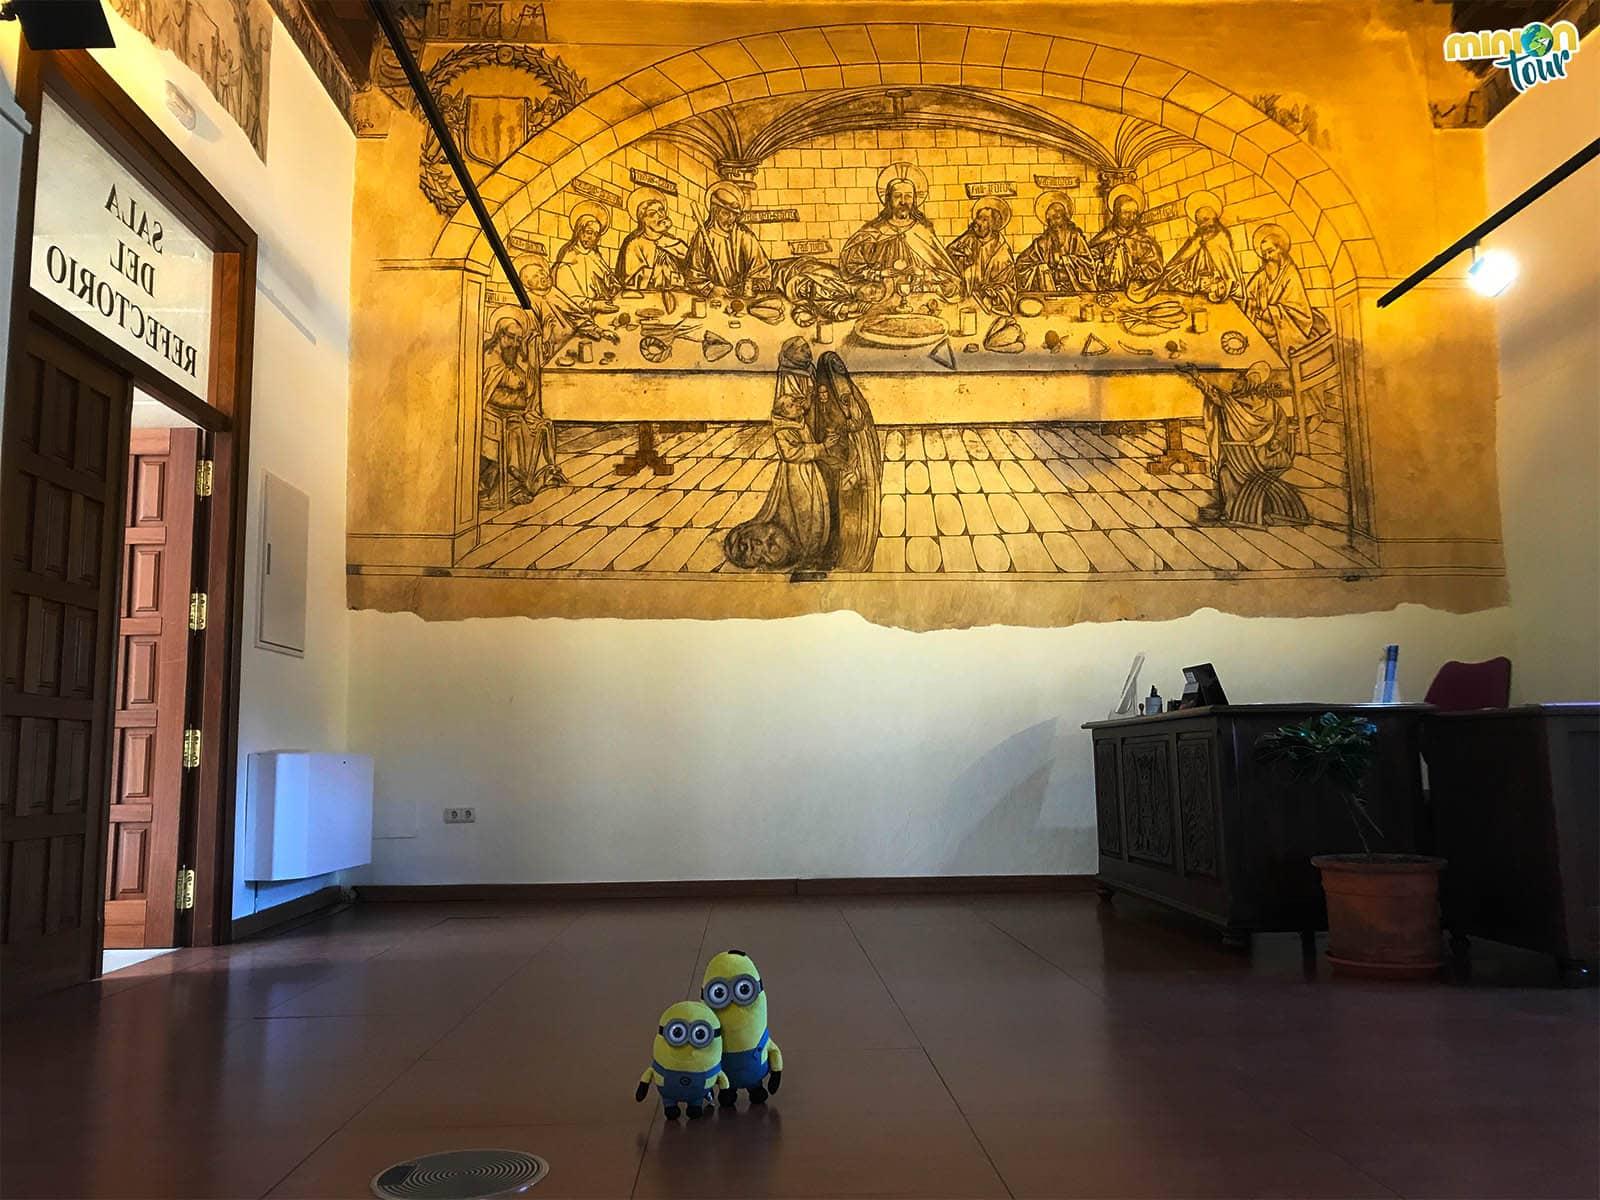 La Sala del Refectorio tiene un mural con mucha historia